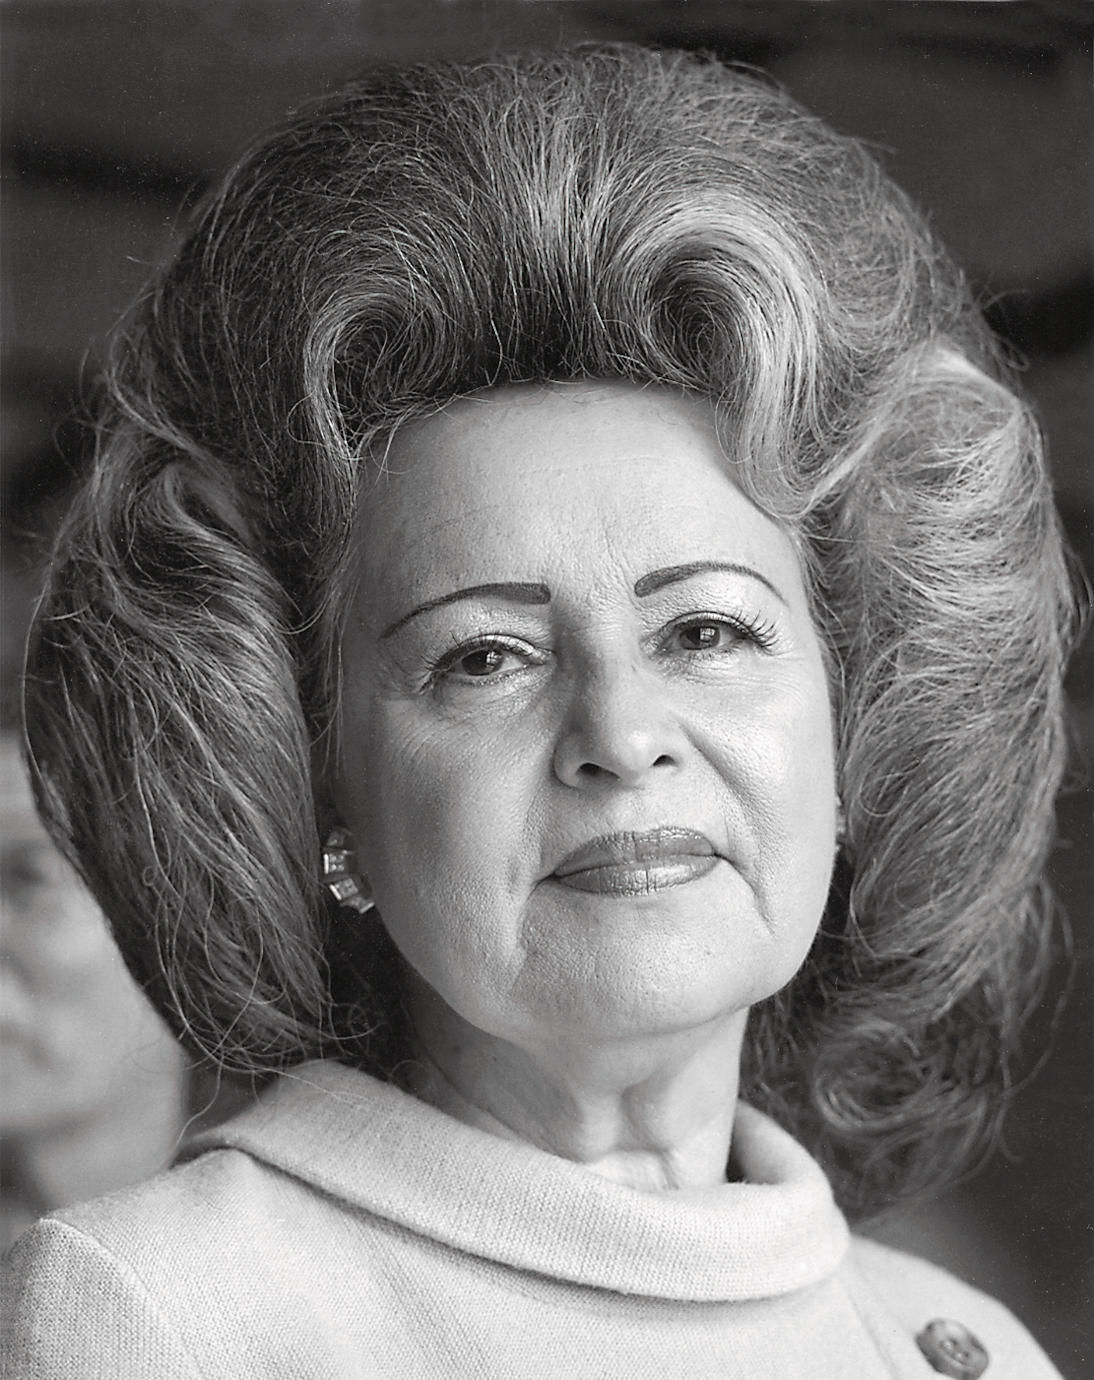 Ms. Proler, Houston, TX, 1976